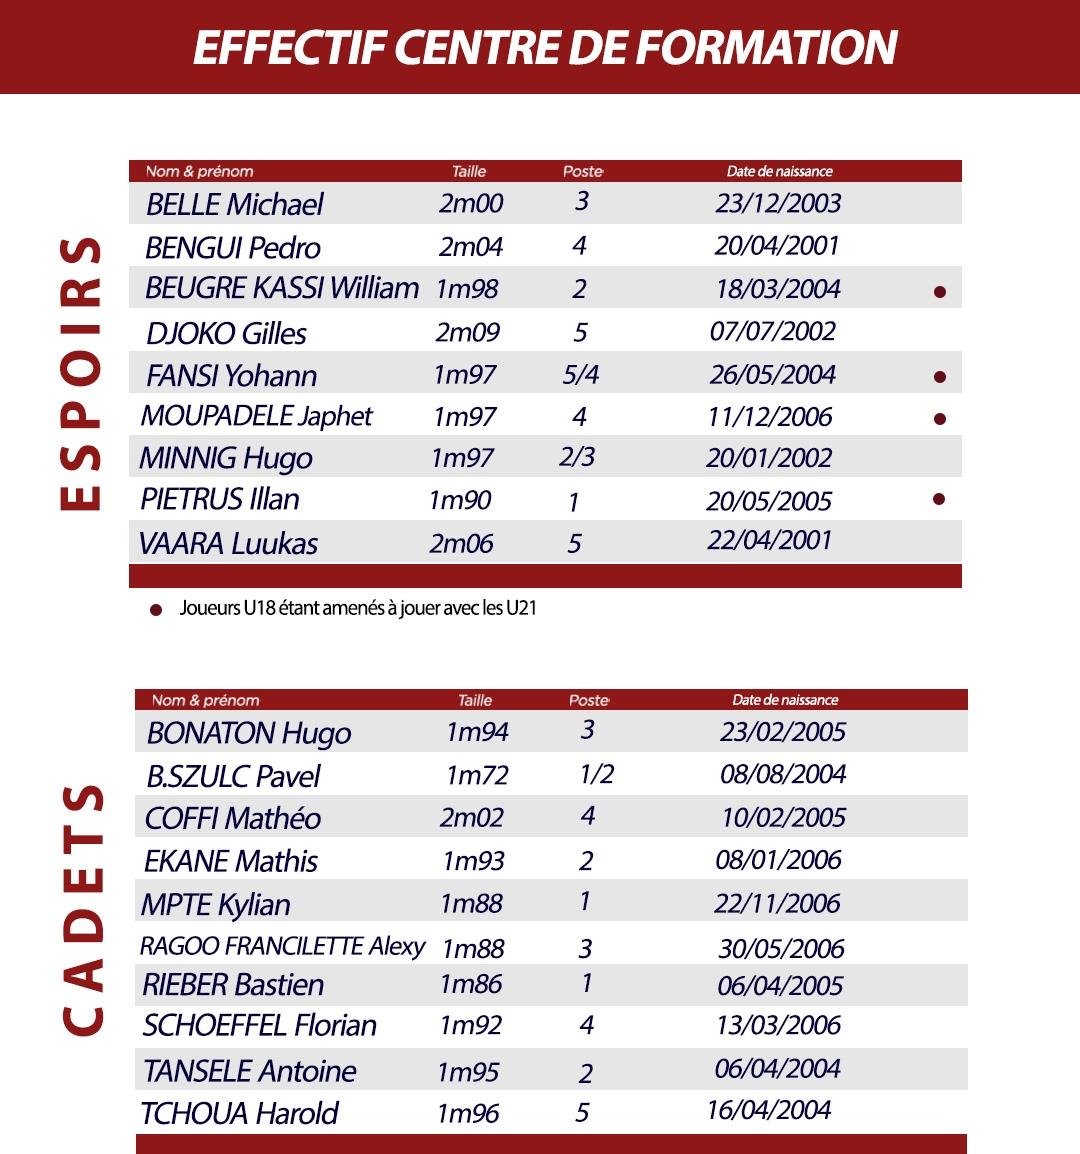 effectif_centre_de_formation.jpg